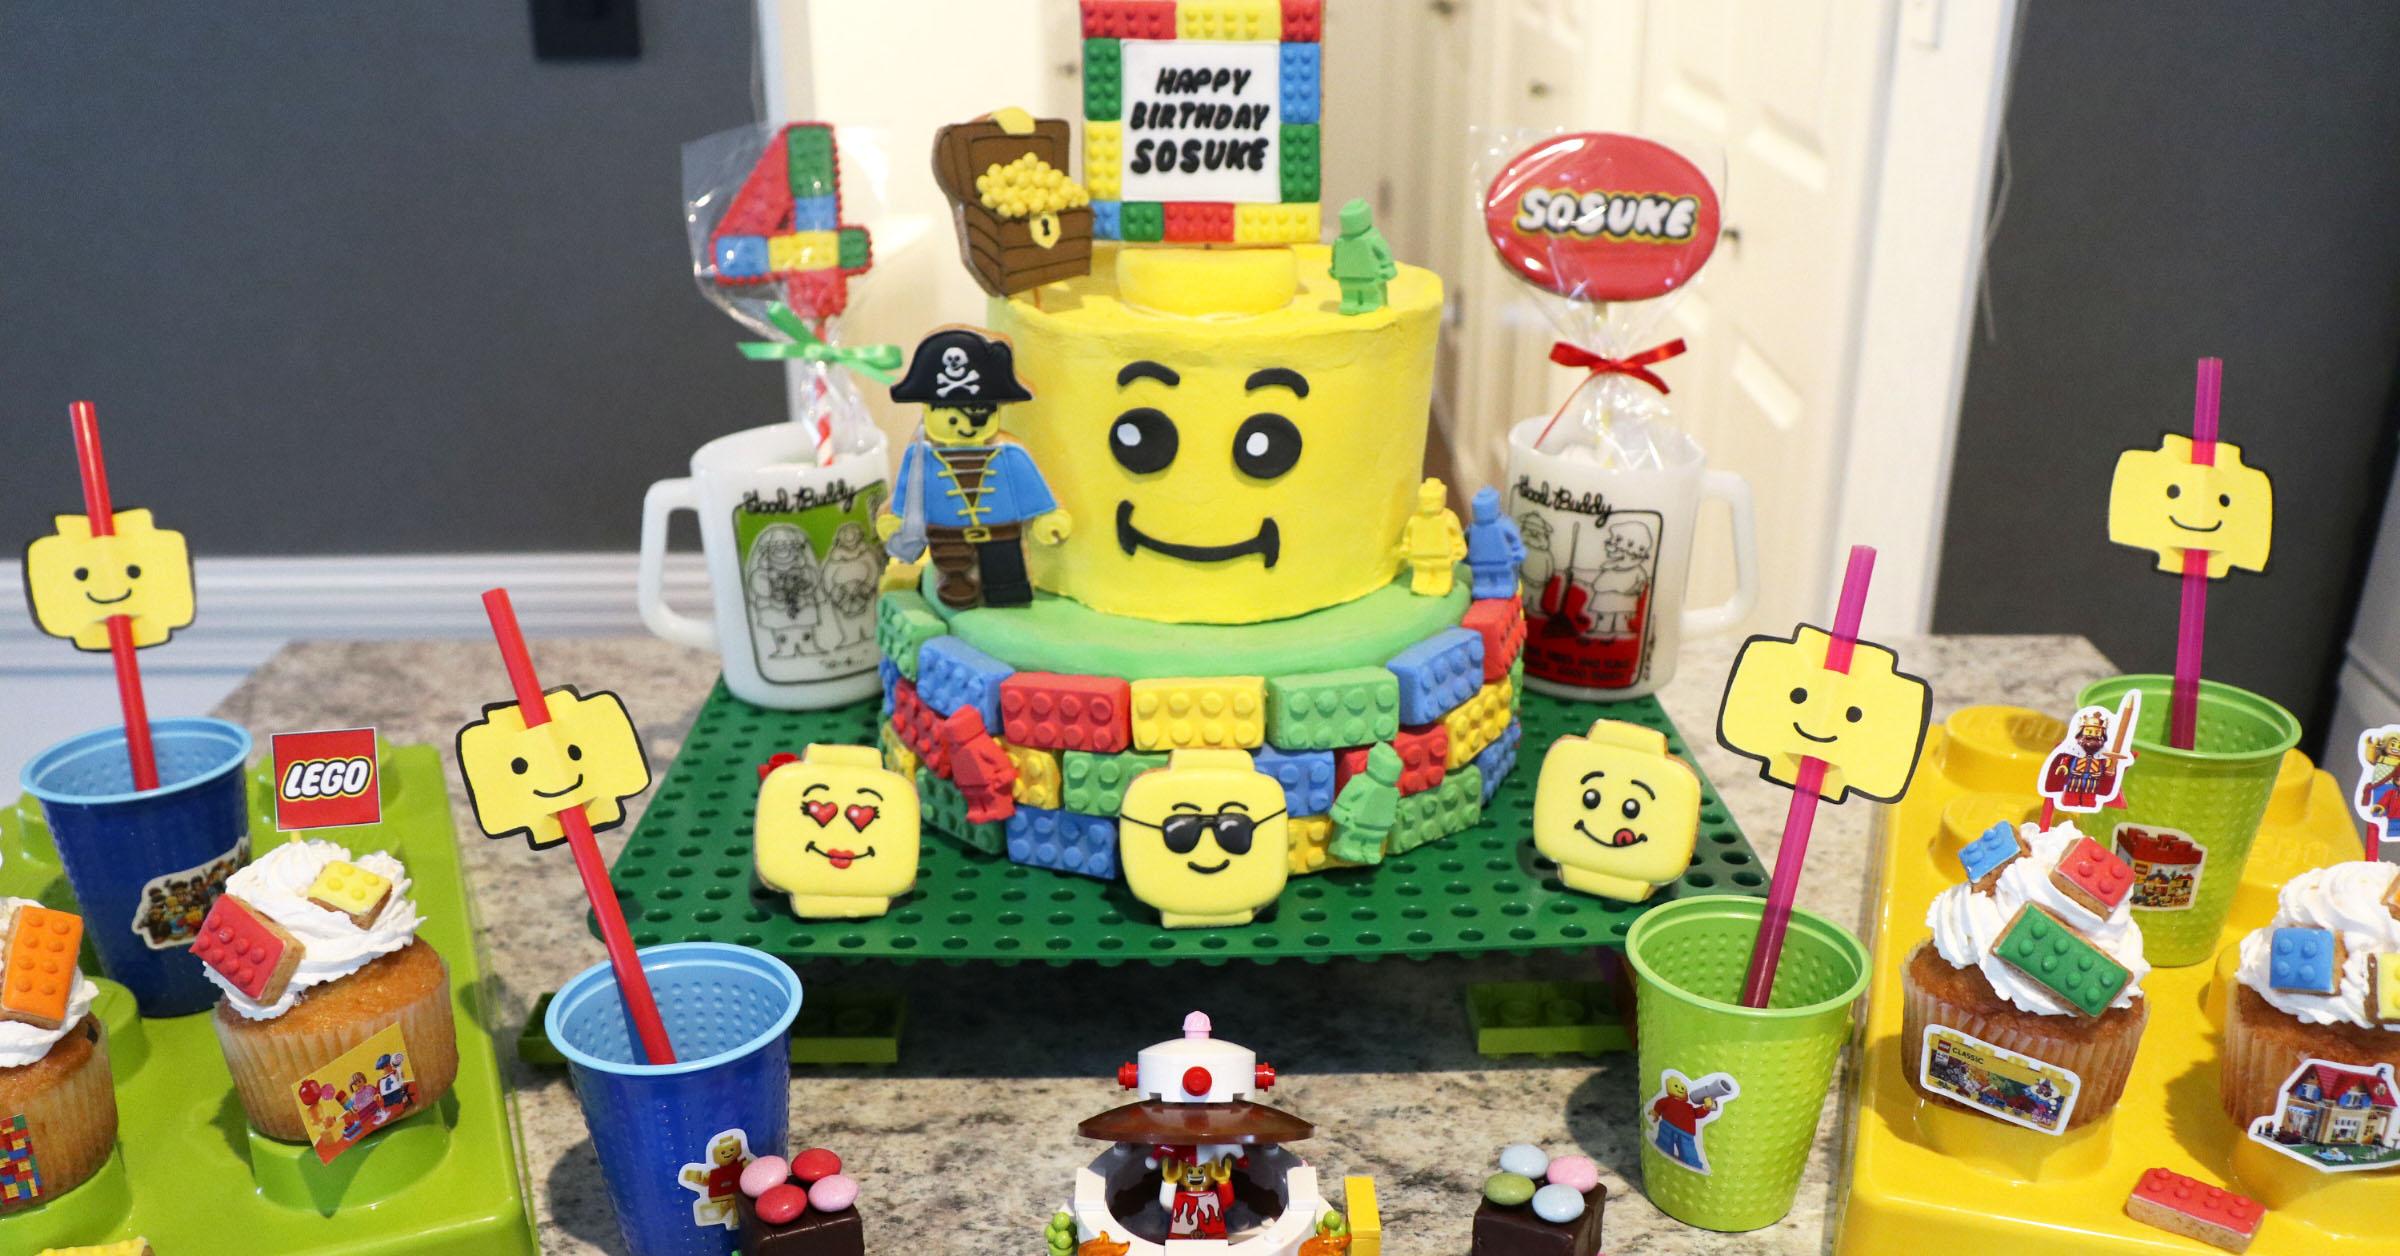 HAPPY BIRTHDAY CAPTAIN LEGO